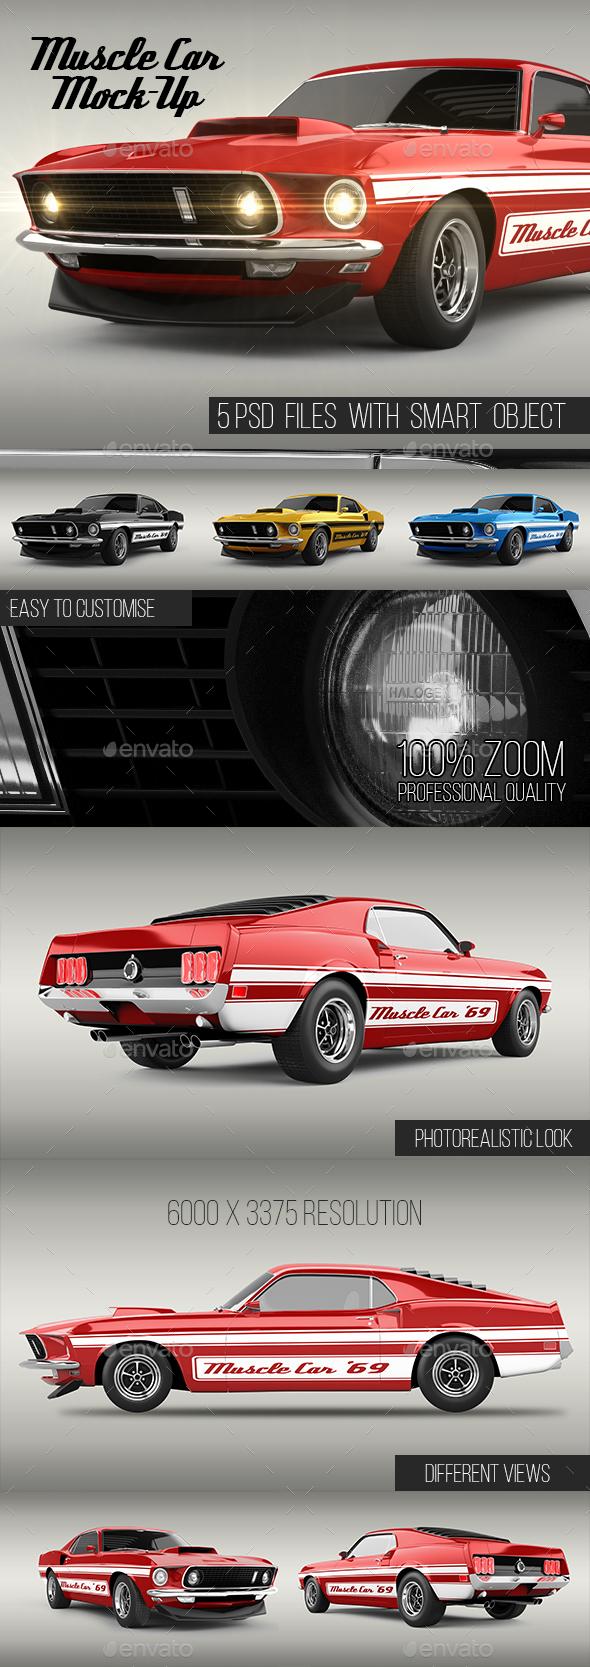 Muscle Car Mock-up - Vehicle Wraps Print